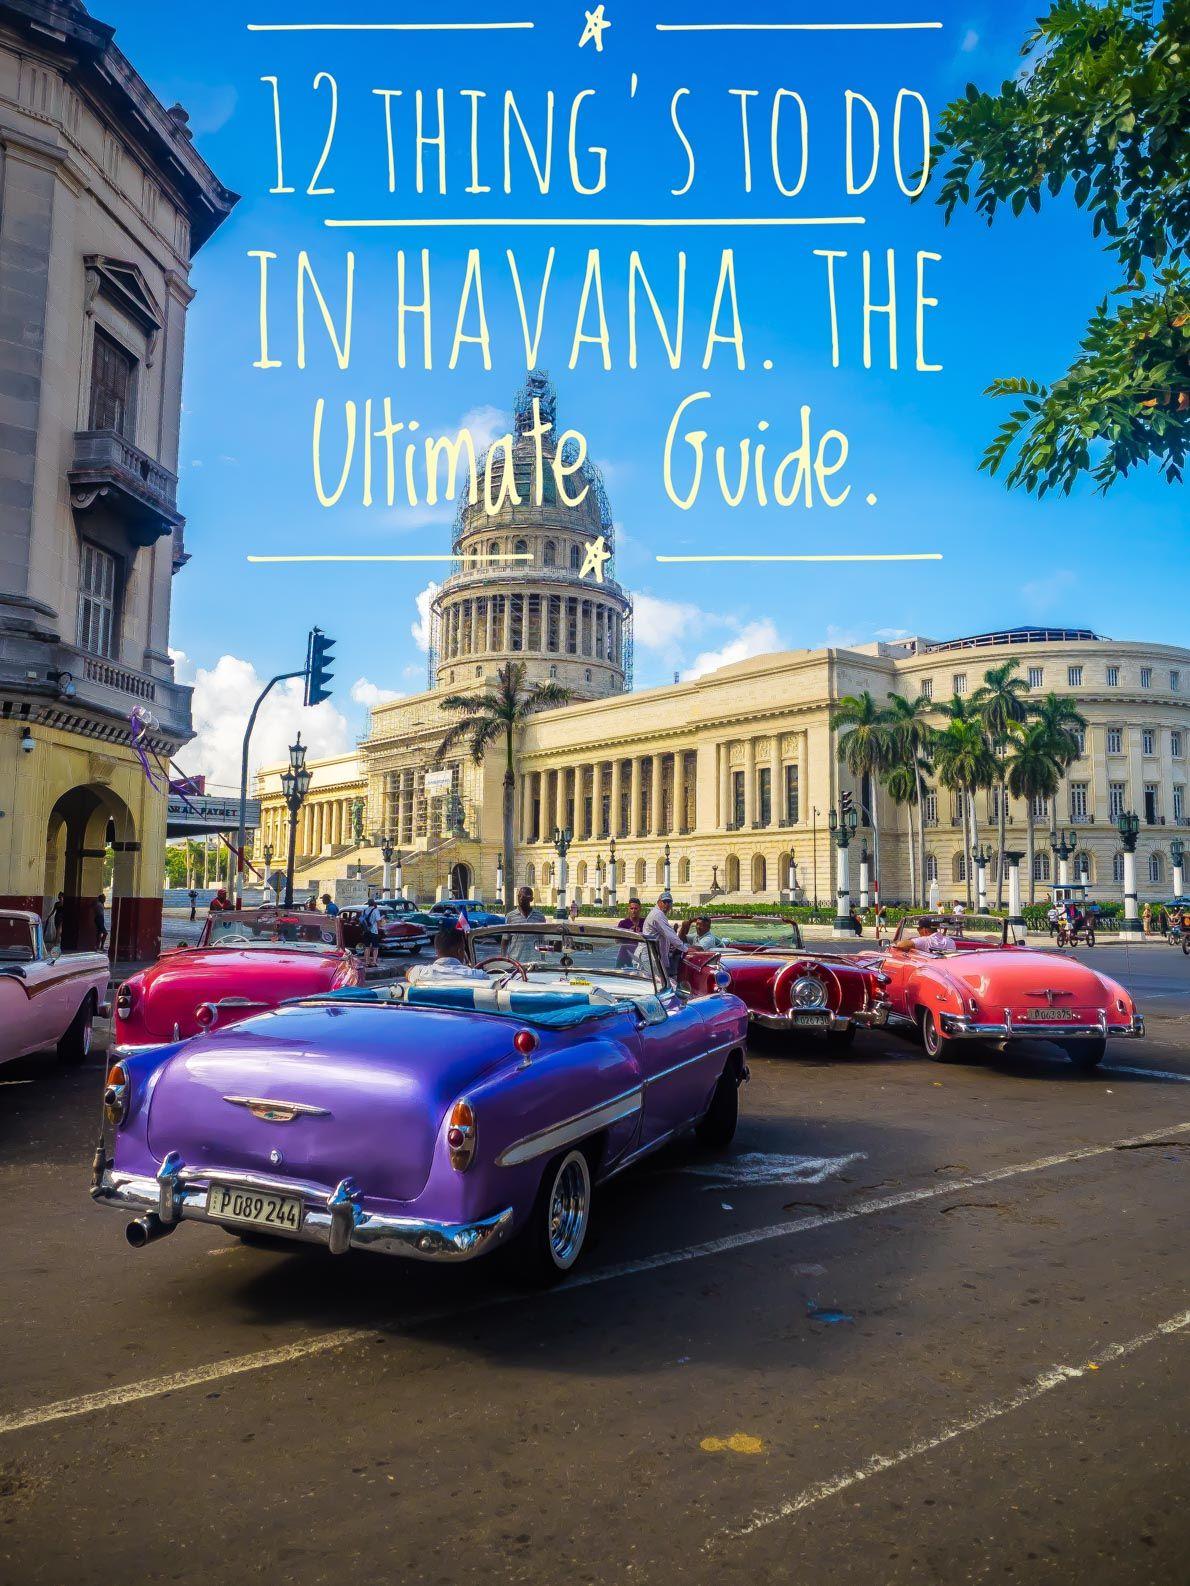 12 Amazing Things to do in Havana, Cuba | Cuba travel ...